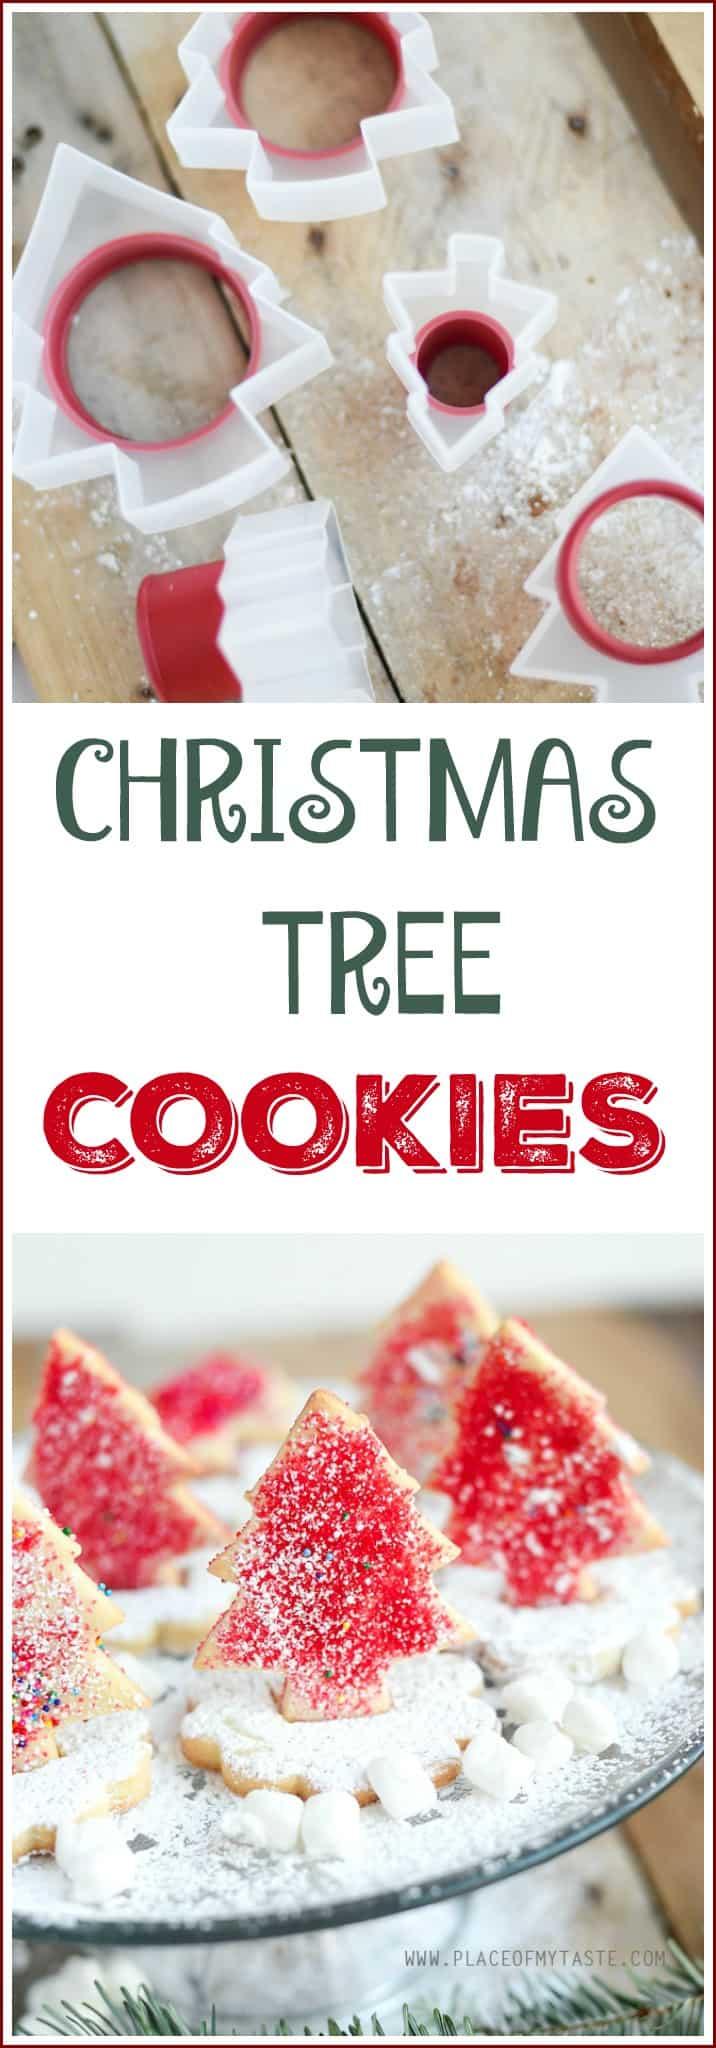 Christmas cookies- so cool!